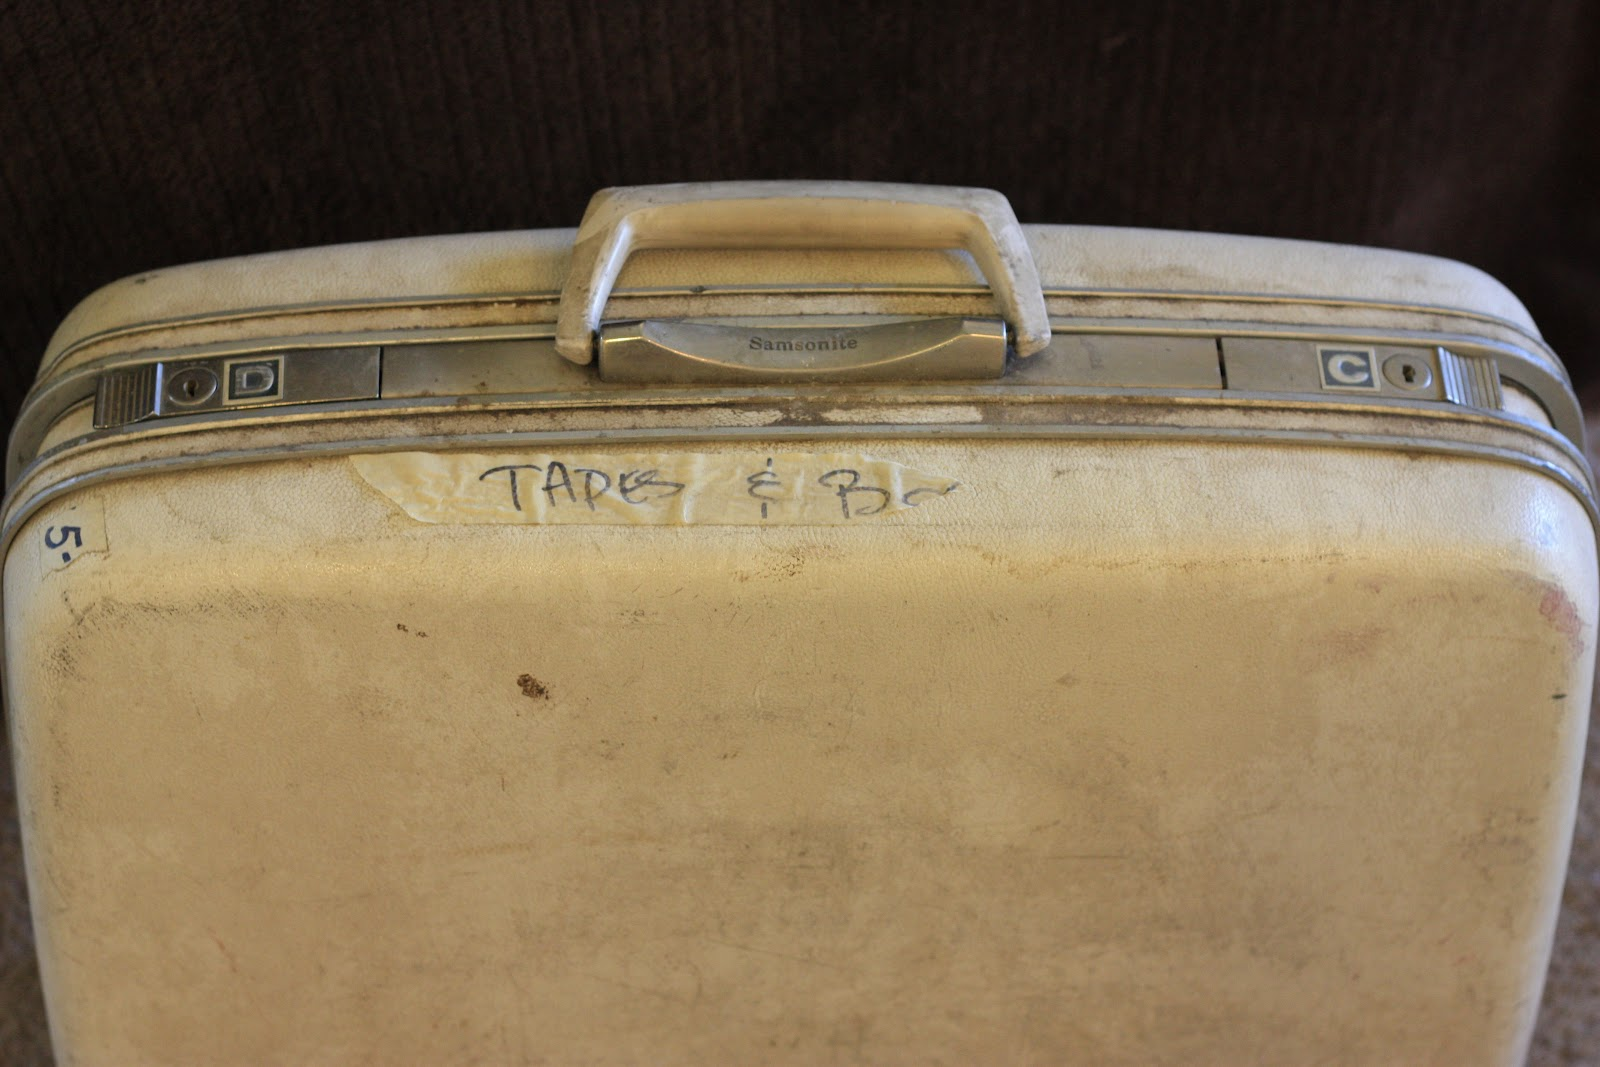 That Morris Family 5 Old School Samsonite Luggage Makover